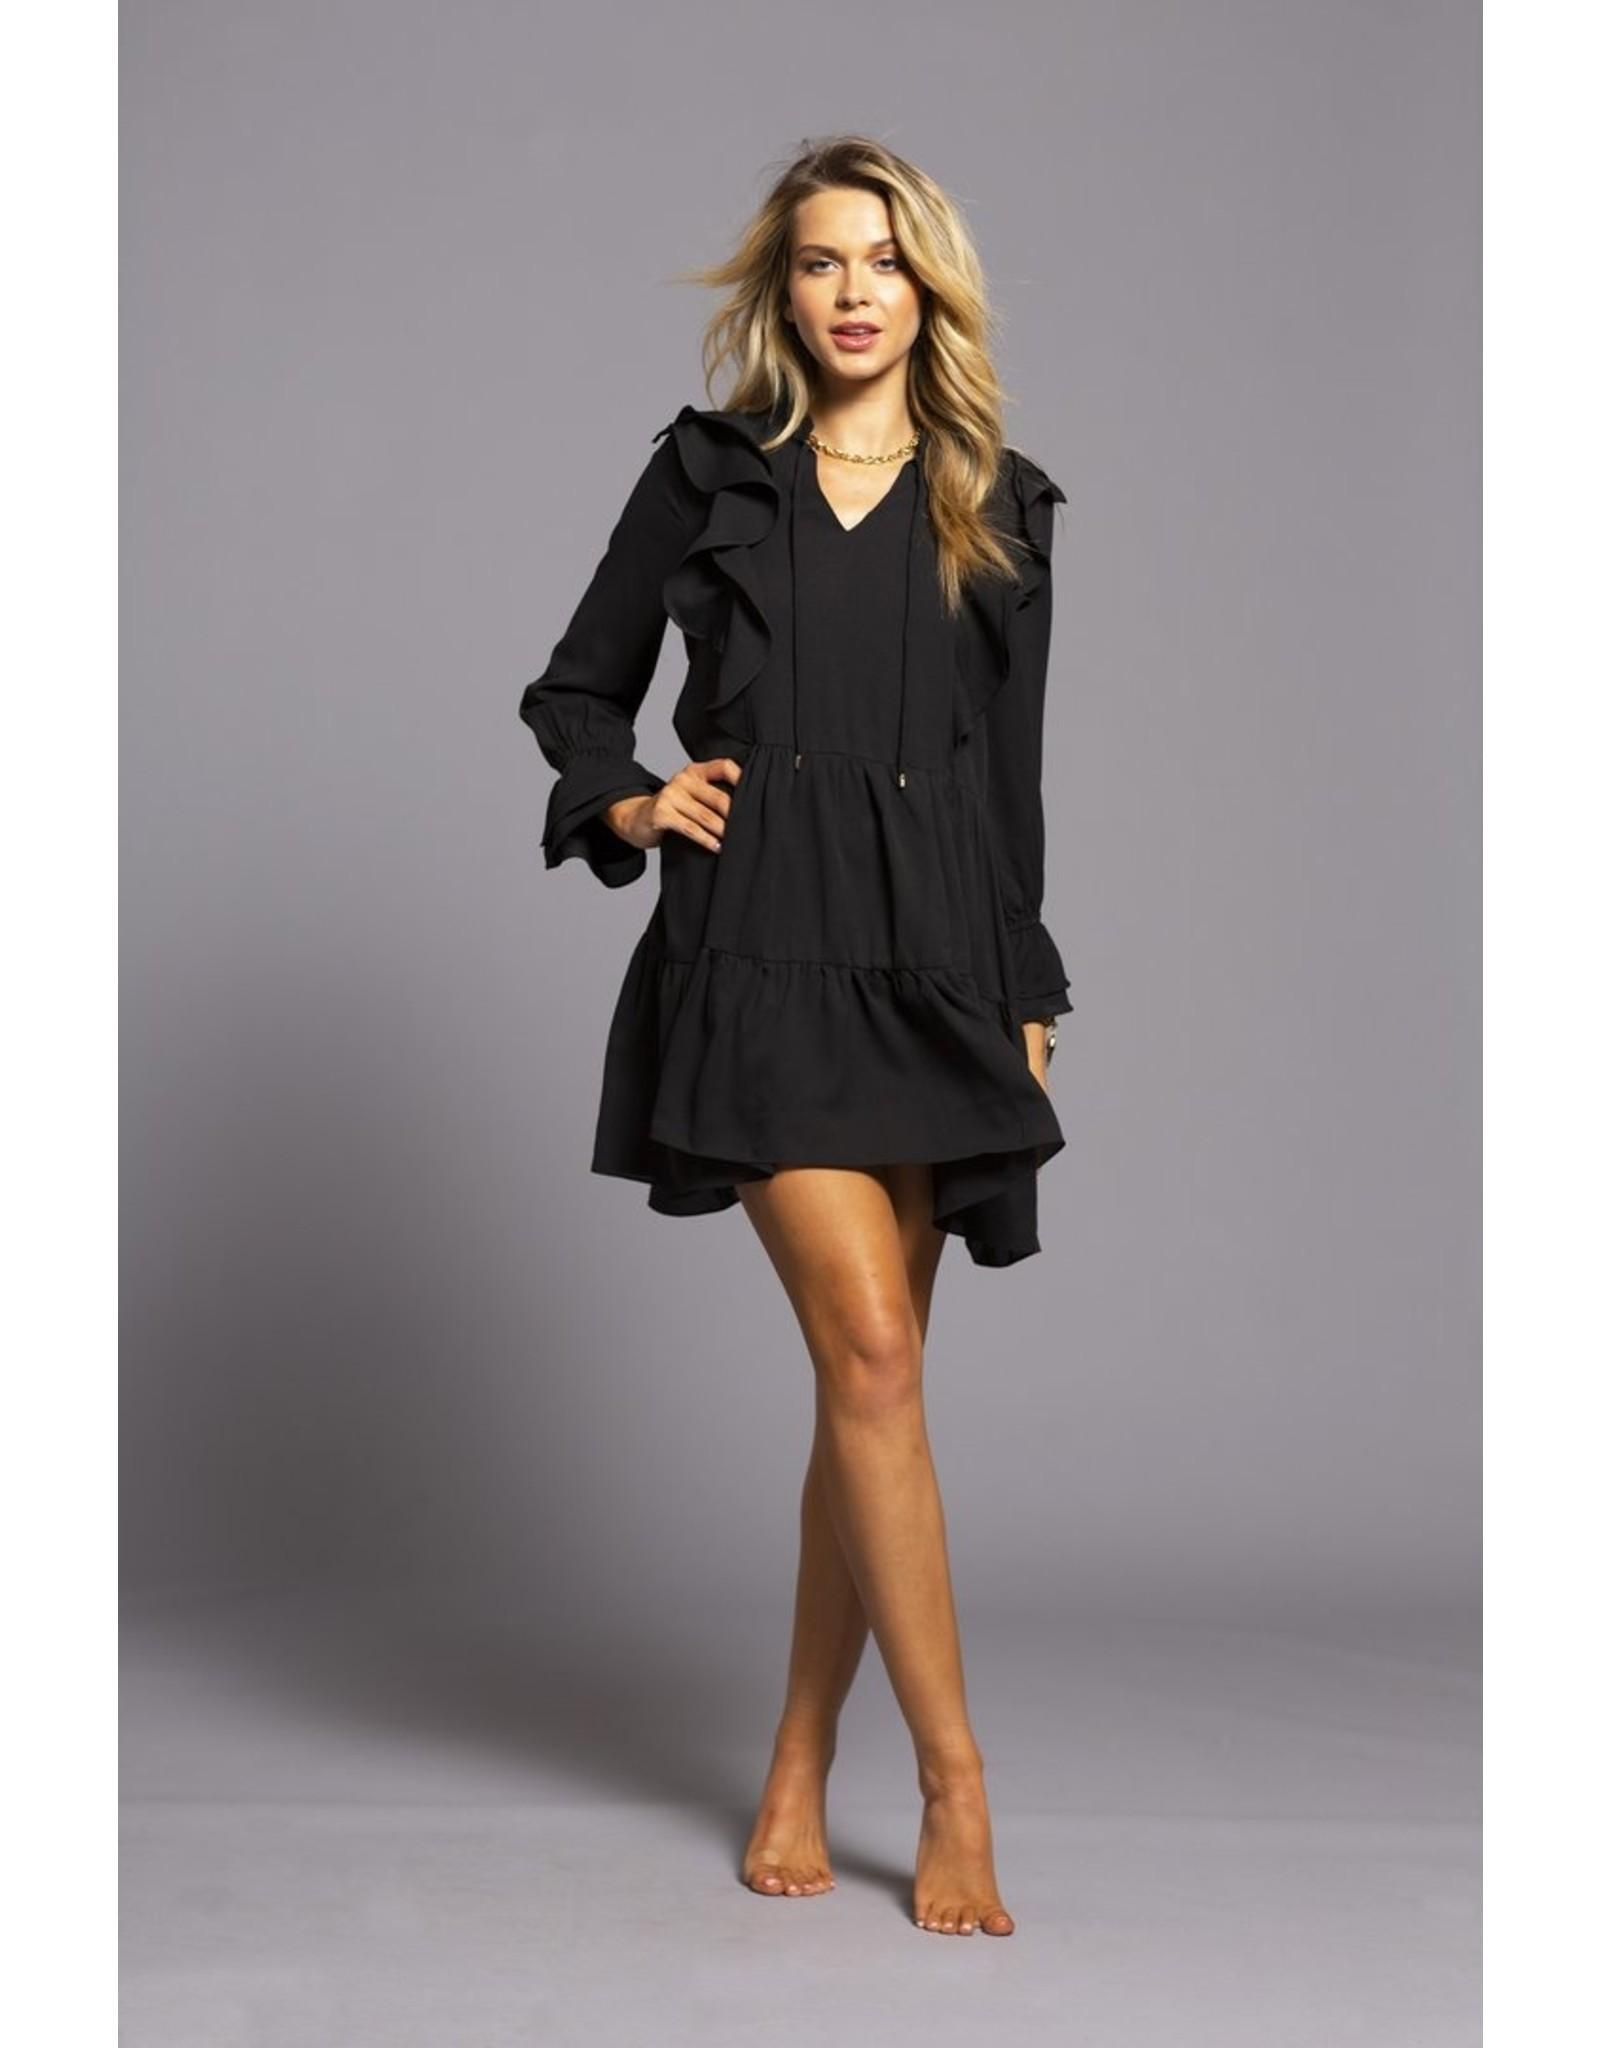 Caroline Ruffle Detail Dress